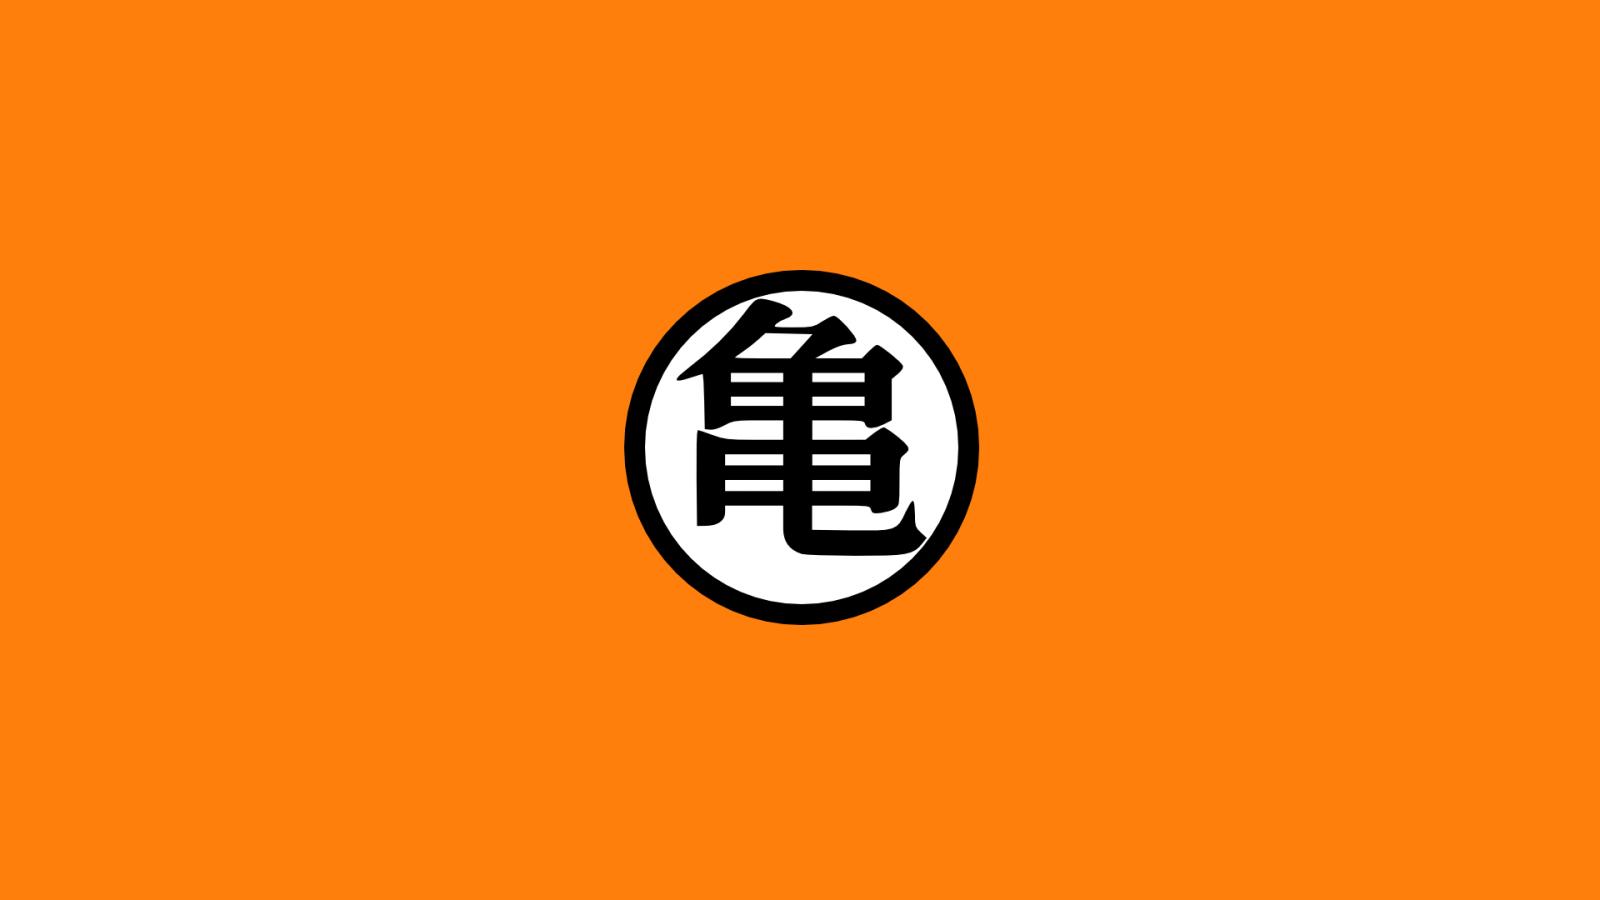 Wallpaper : illustration, text, logo, circle, Dragon Ball ...